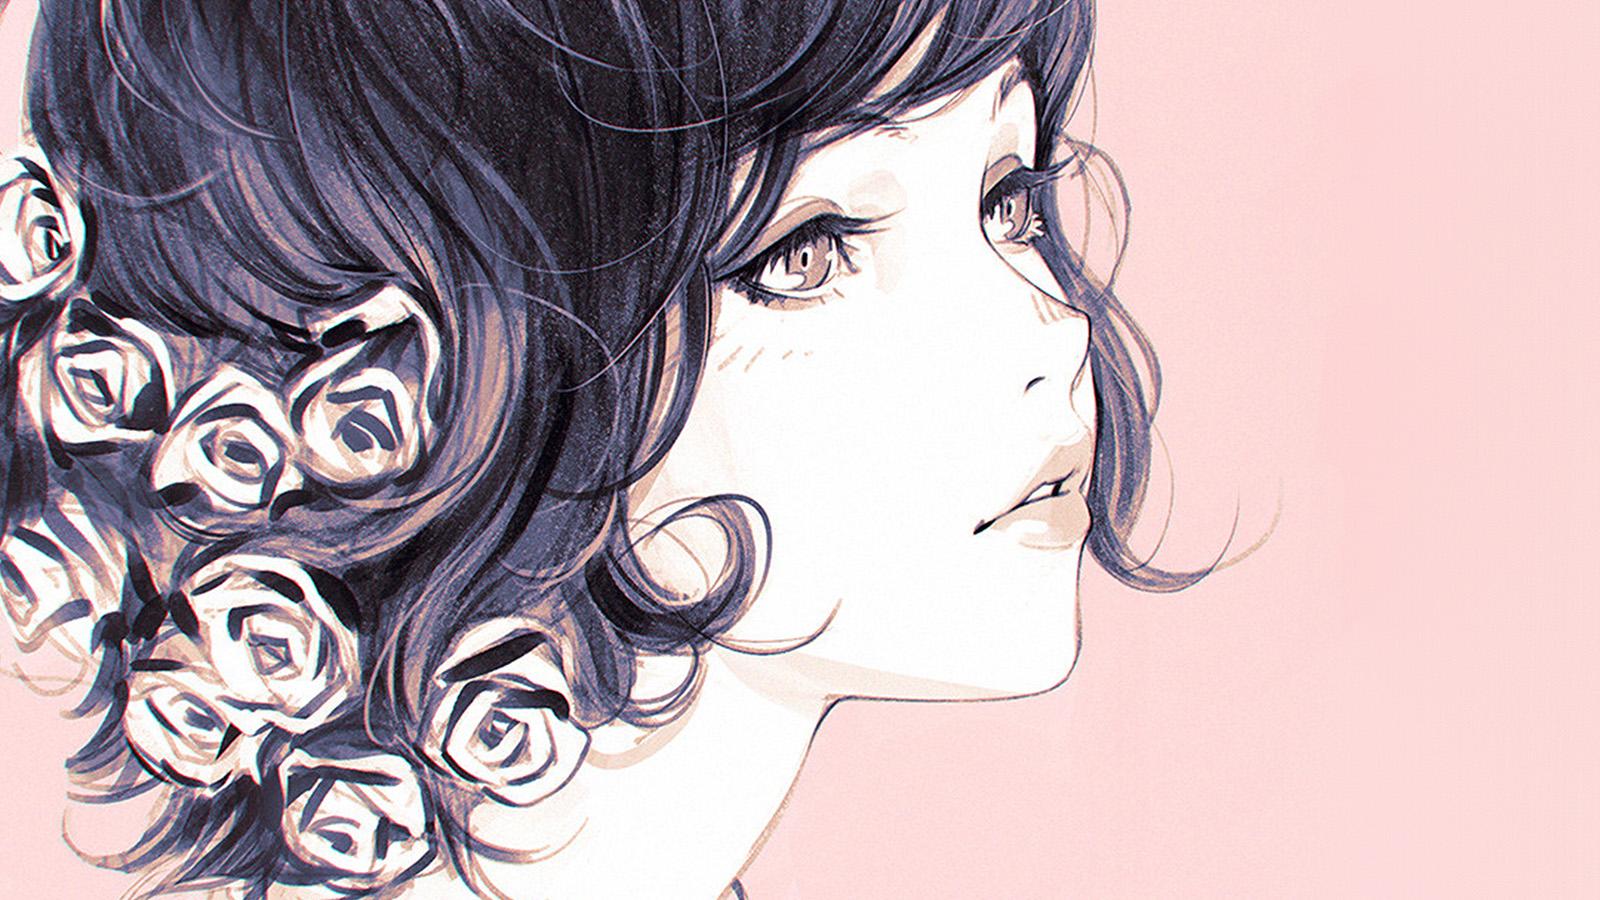 Fall Iphone Wallpaper Pinterest Az01 Girl Flower Lady Pink Ilya Kuvshinov Illustration Art